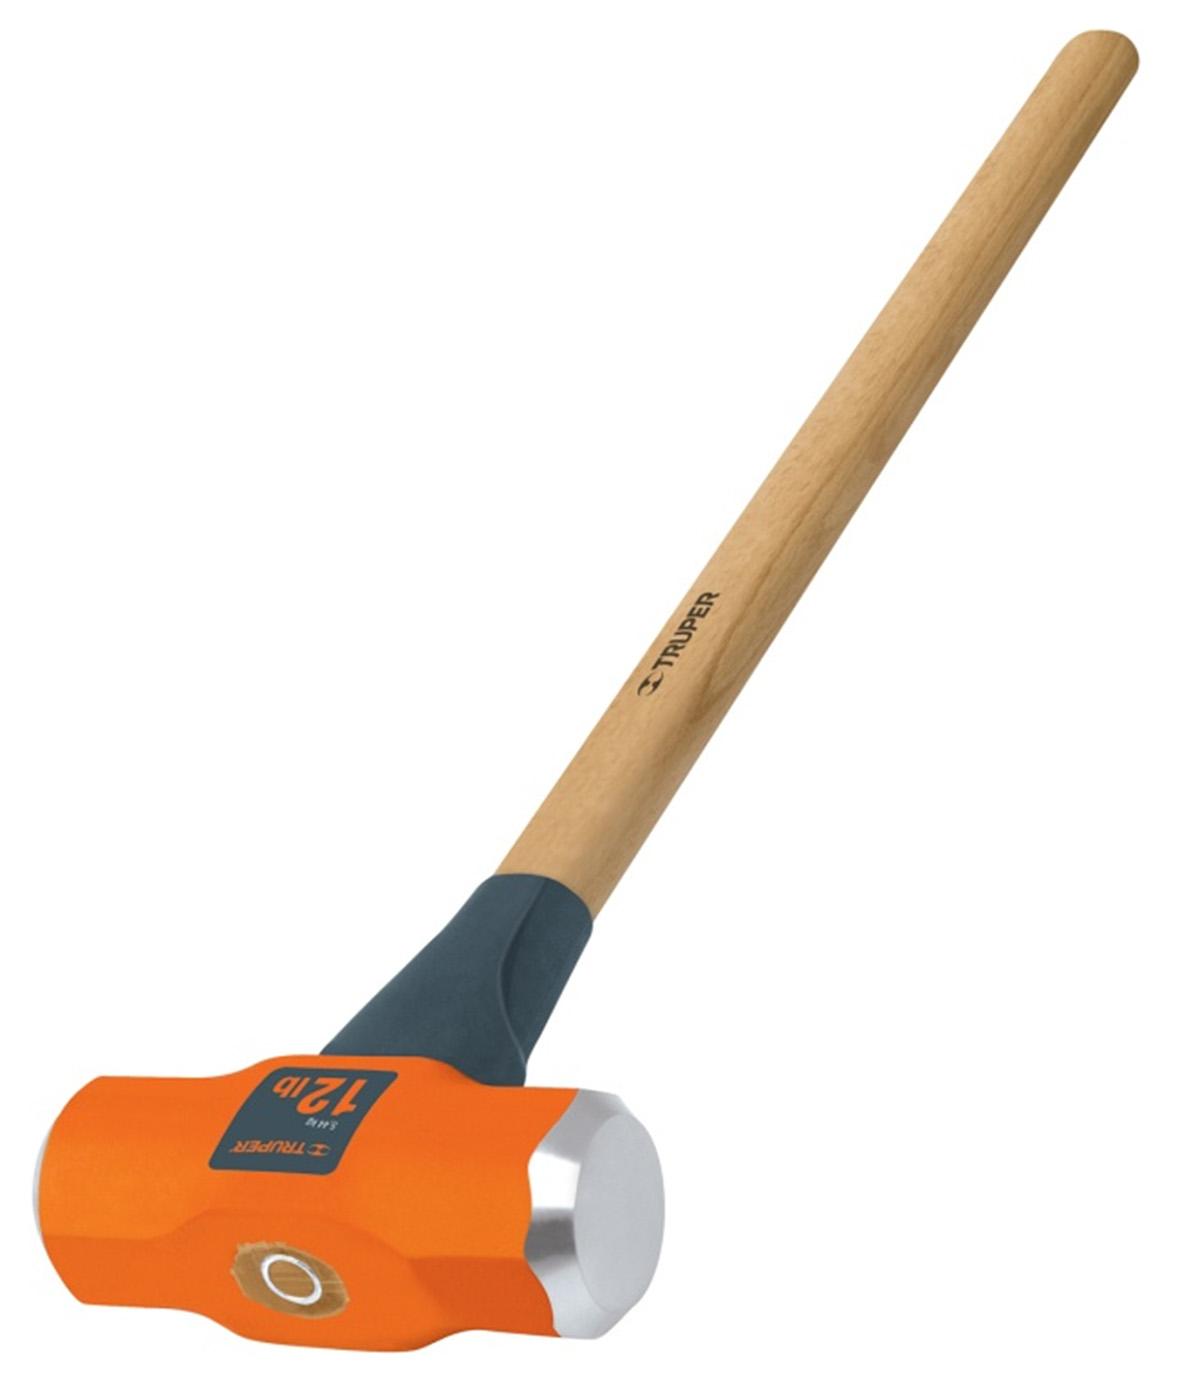 Кувалда Truper Md-8m 16511 кусачки усиленные truper tni 8 17381 200мм